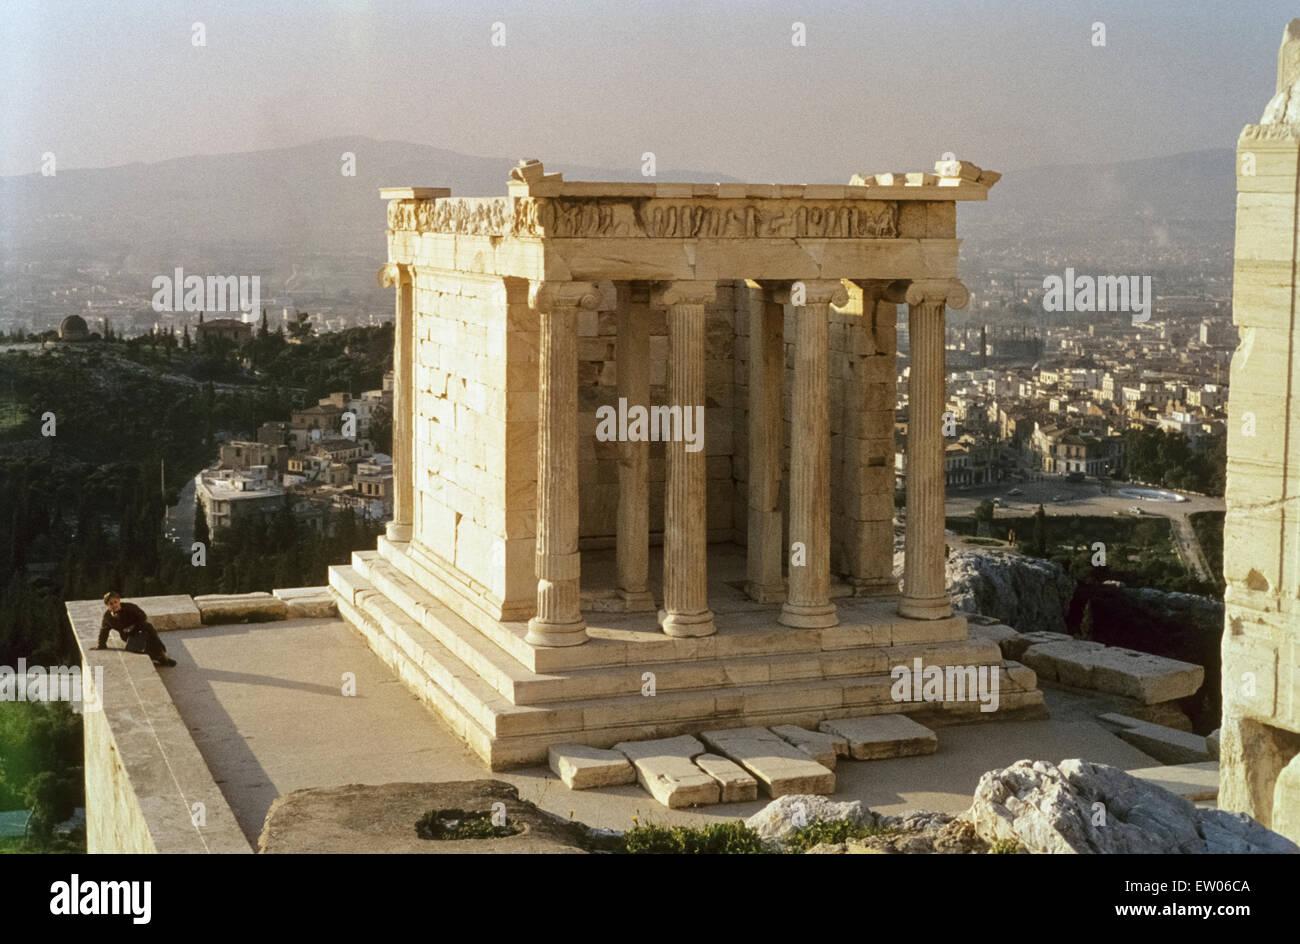 Temple of Athena Nike in the mid-sixties Historische Aufnahme des Niketempels der Akropolis in den Sechzigerjahren Stock Photo